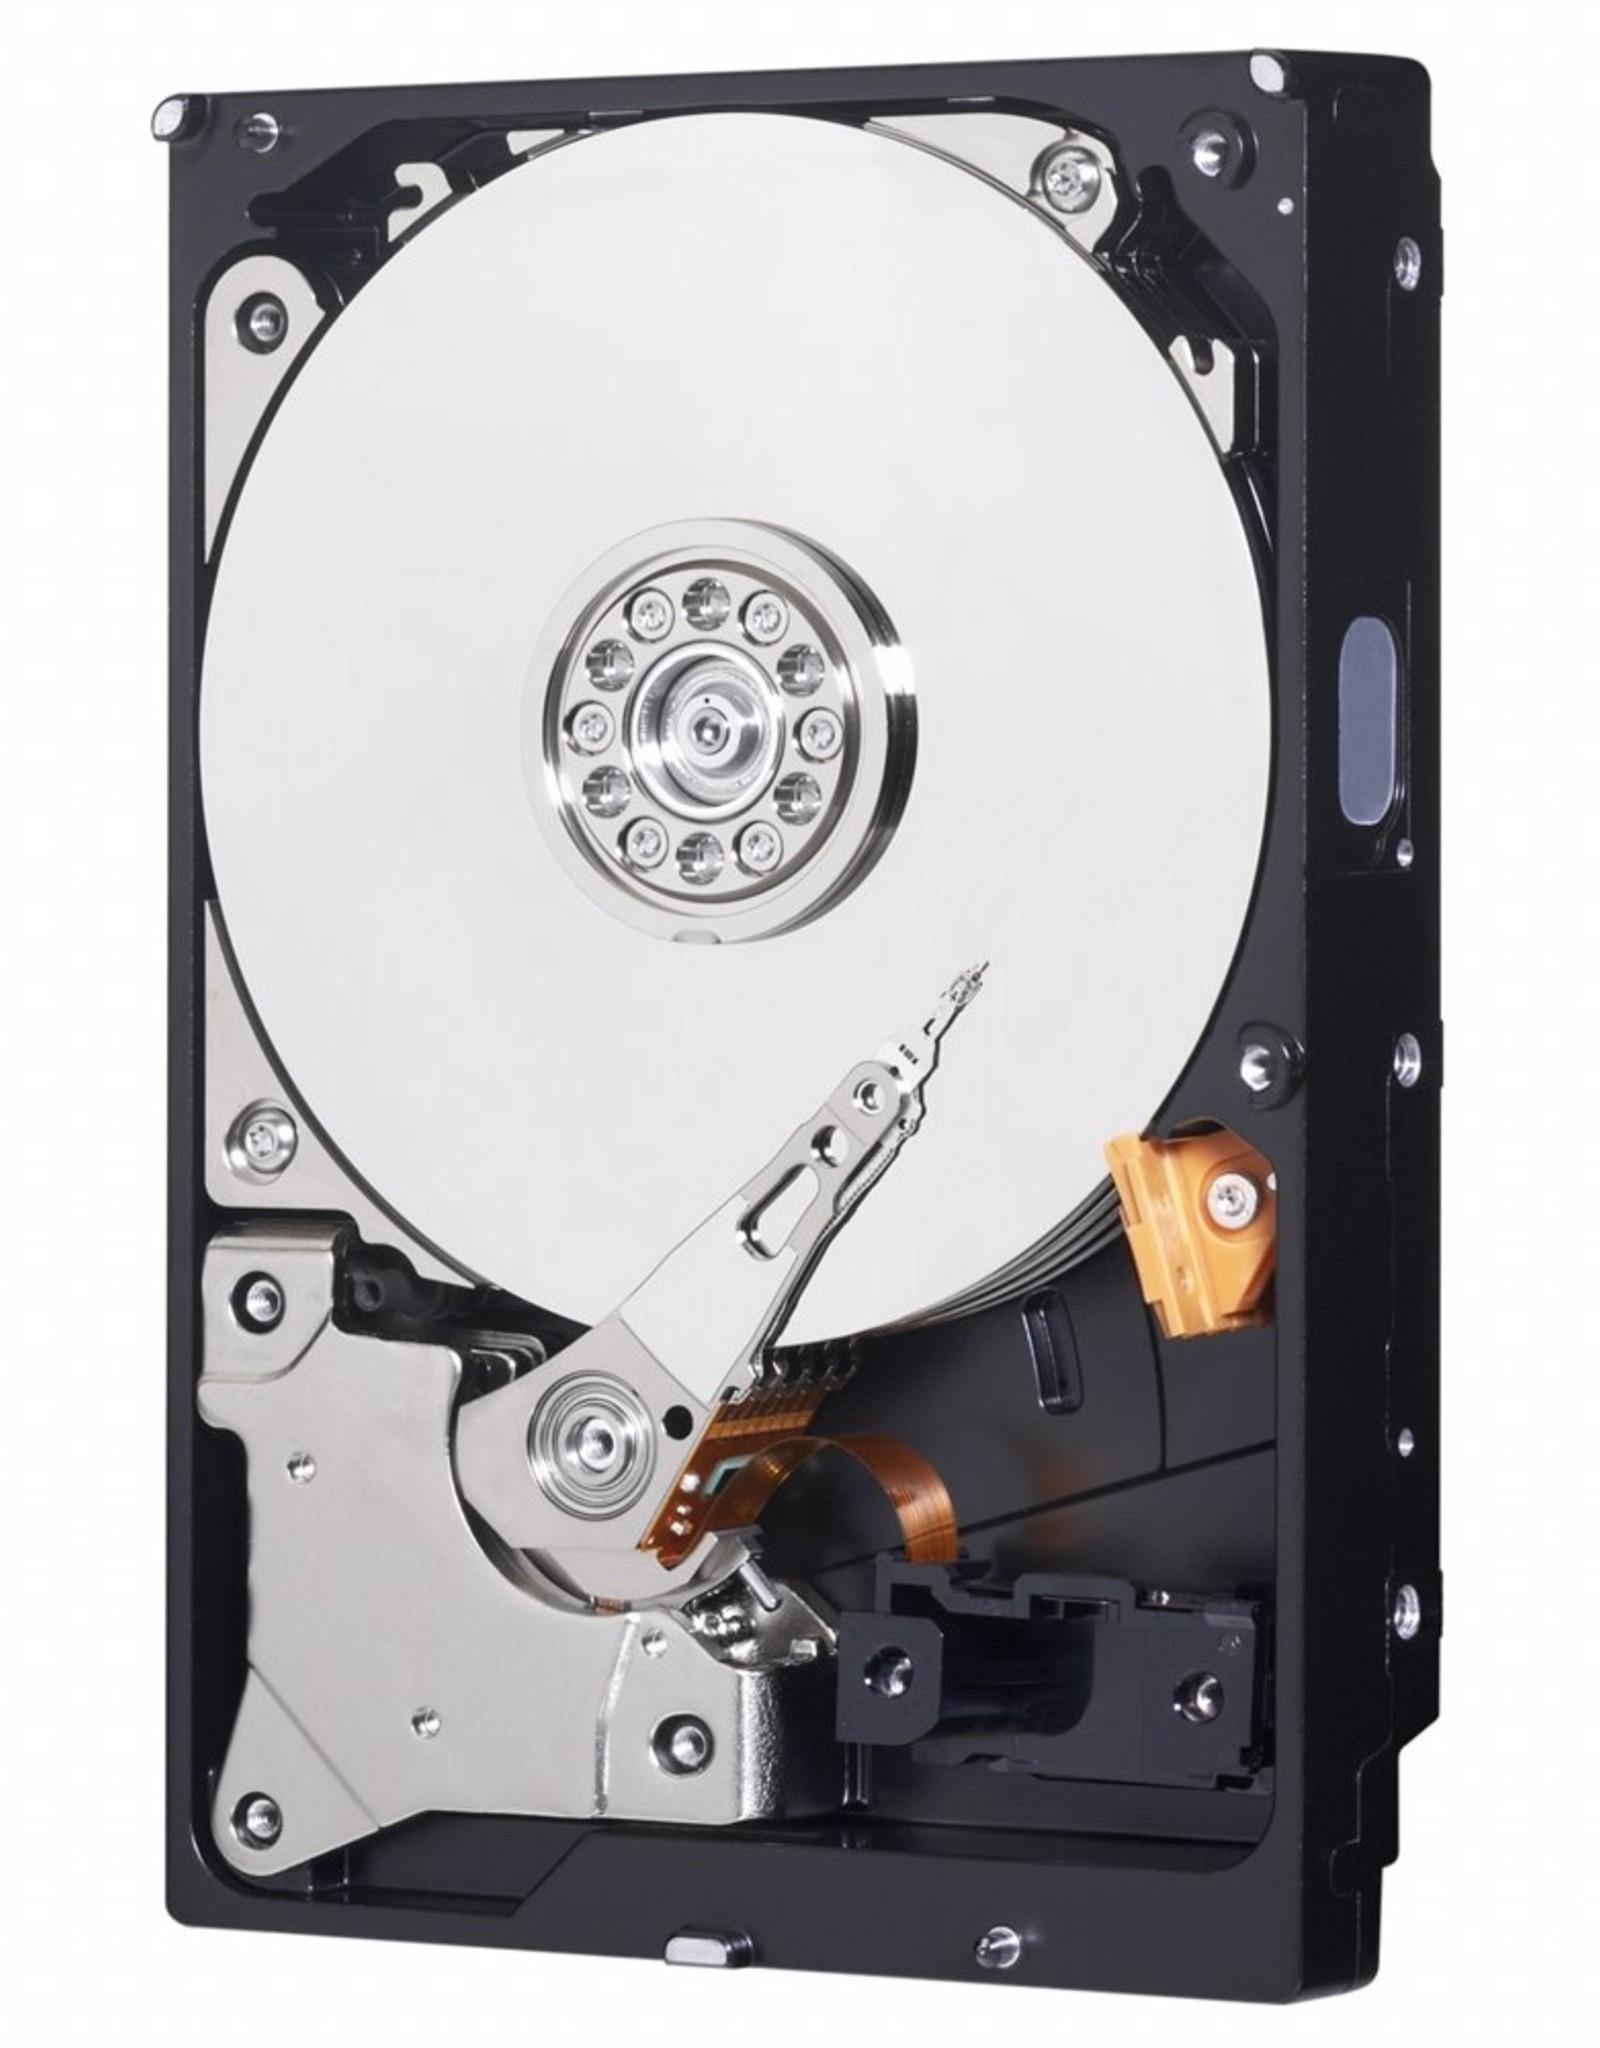 HDD WD ™ Blue 4TB IntelliPower - 64MB - SATA3 3.5 inch